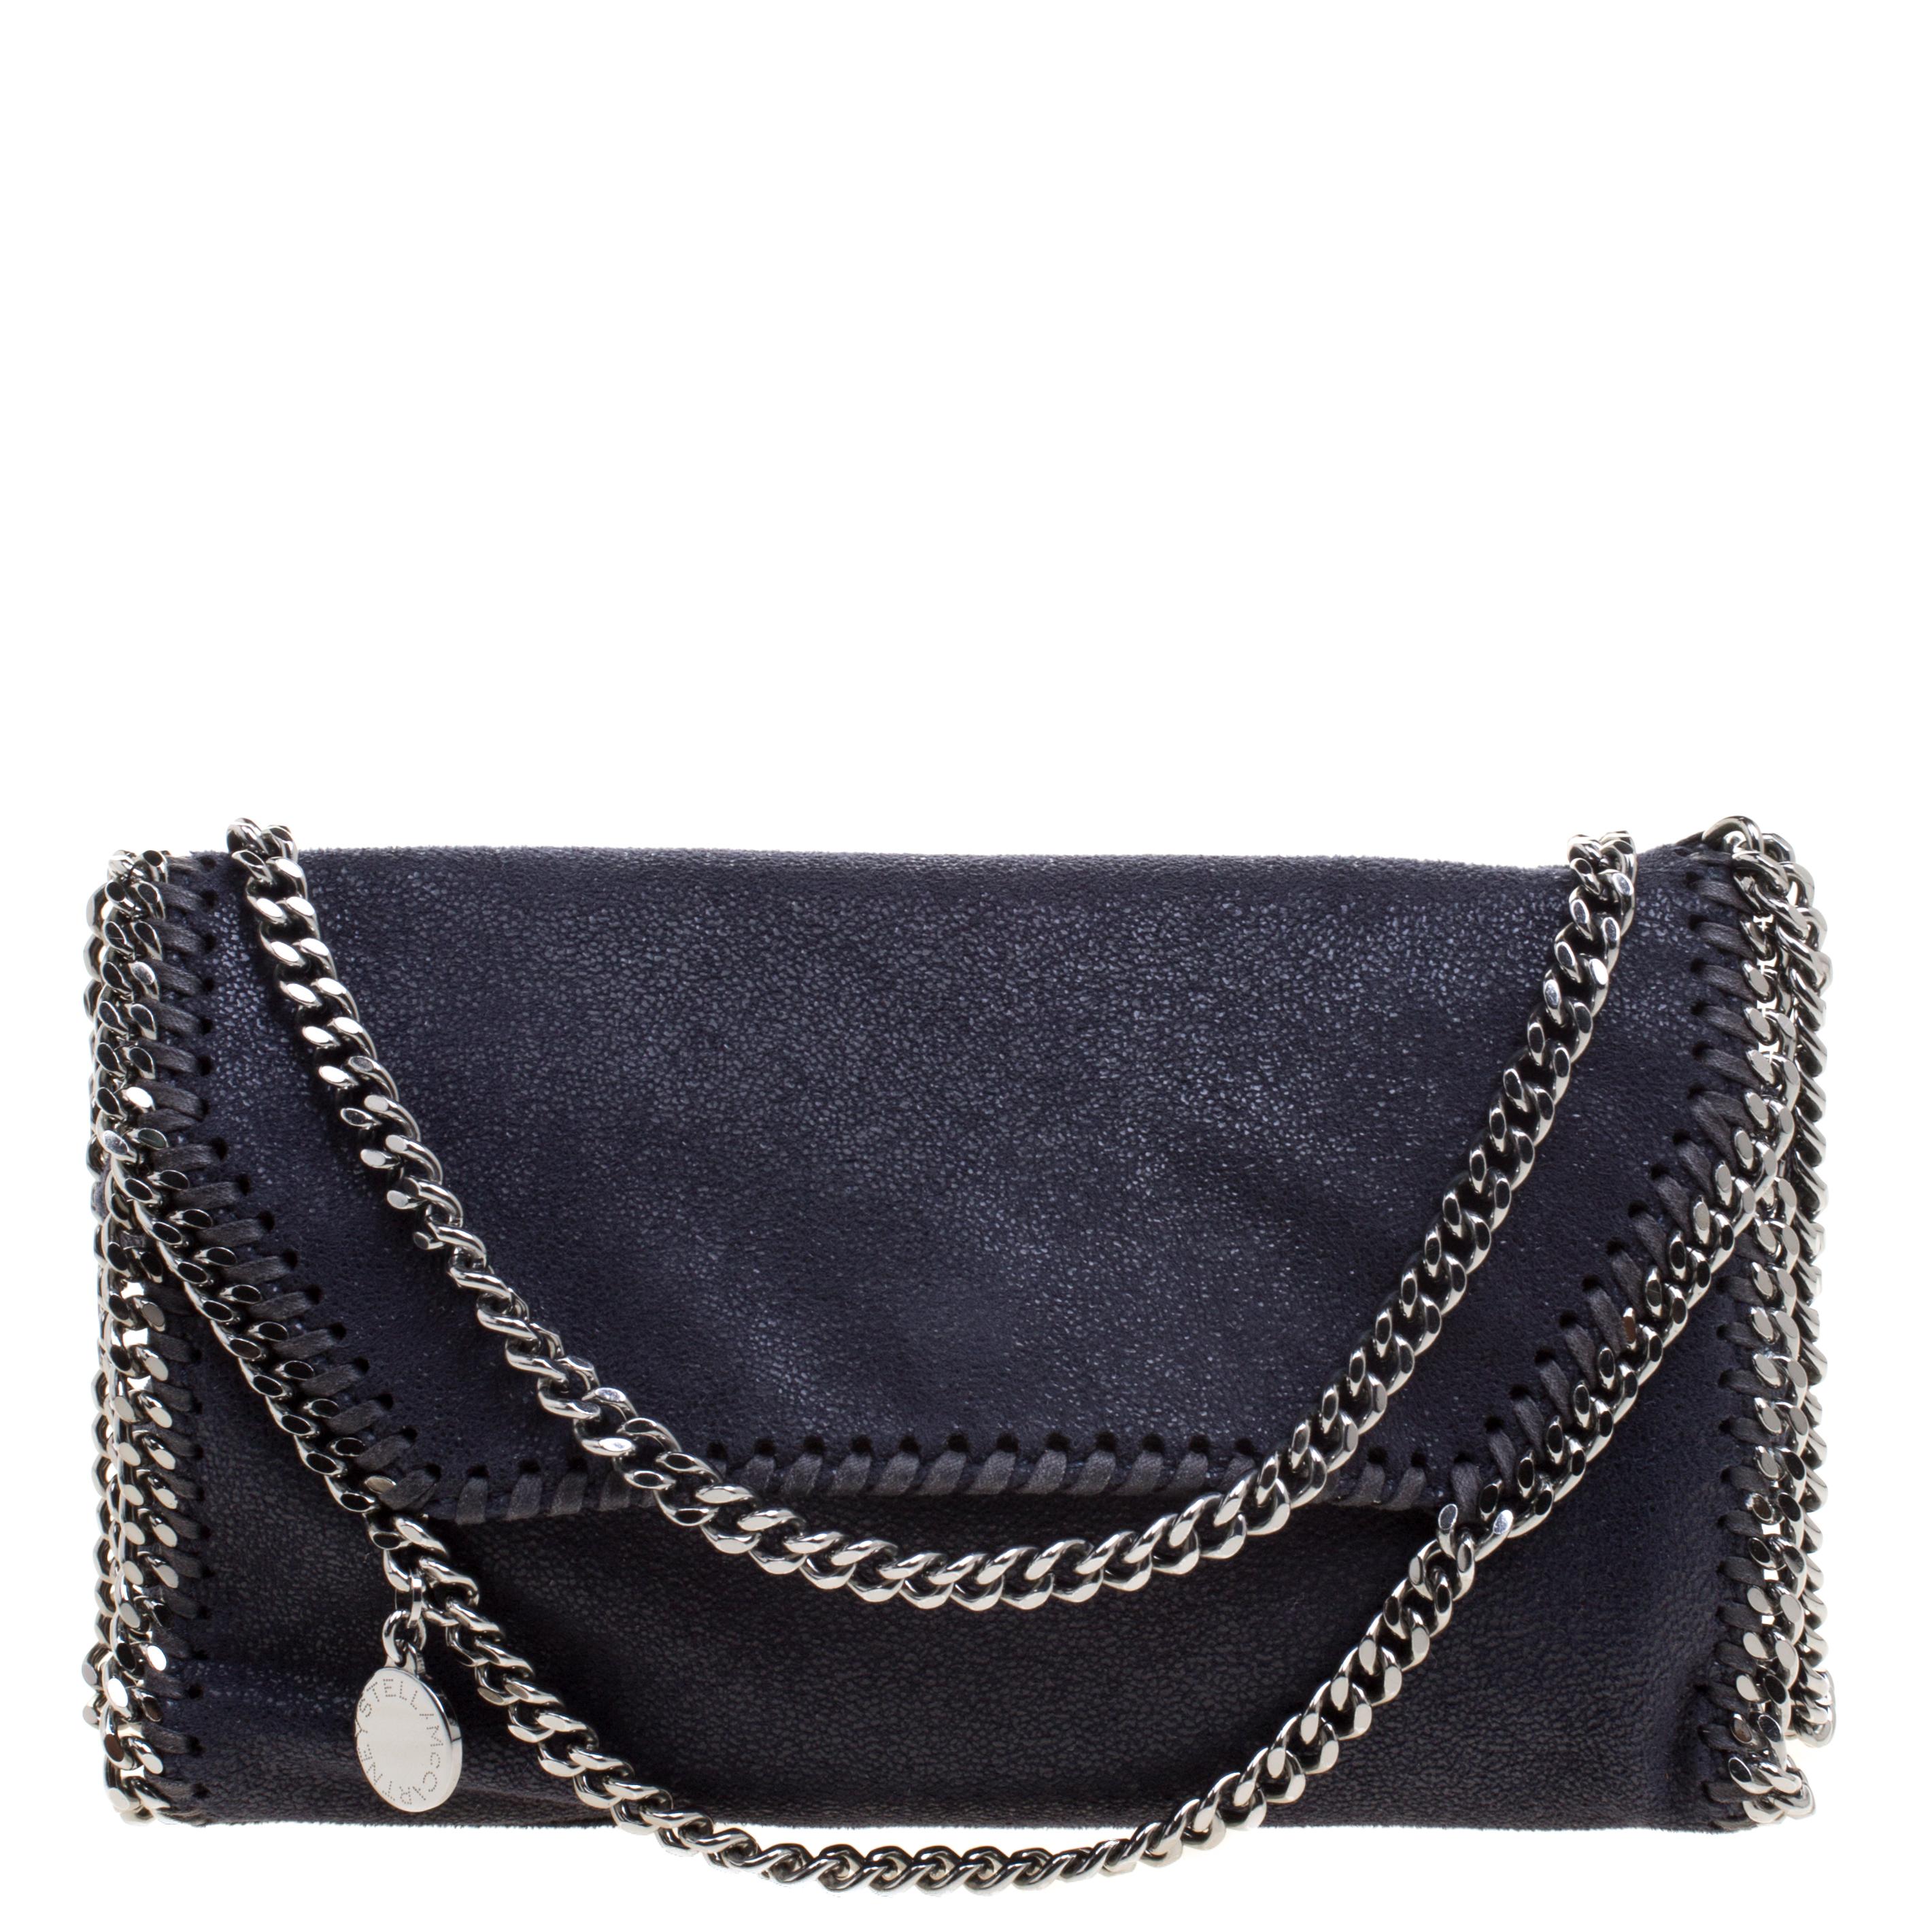 33e6741c30c8 ... Stella McCartney Navy Blue Faux Leather Falabella Shoulder Bag.  nextprev. prevnext